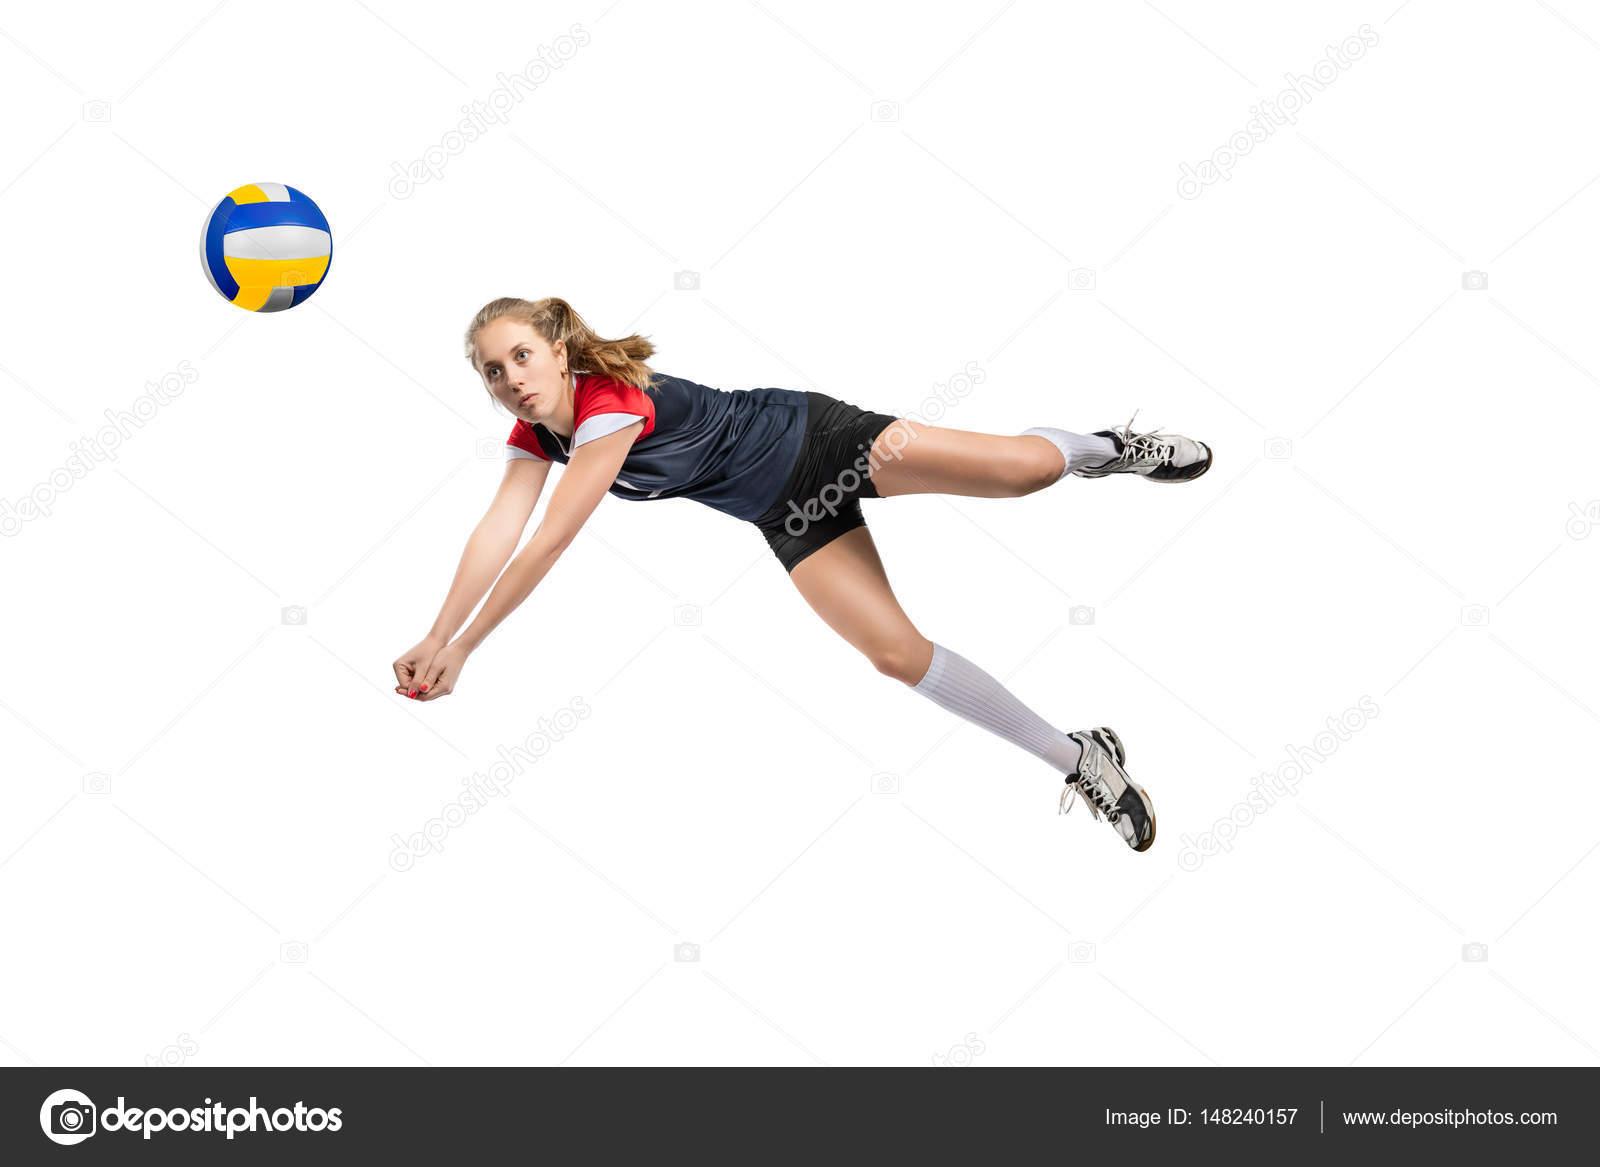 Jugador de voleibol femenino saltando por la pelota duro-a aislada sobre fondo  blanco — Foto de PastaSevenSeven 3670eeacd4be9